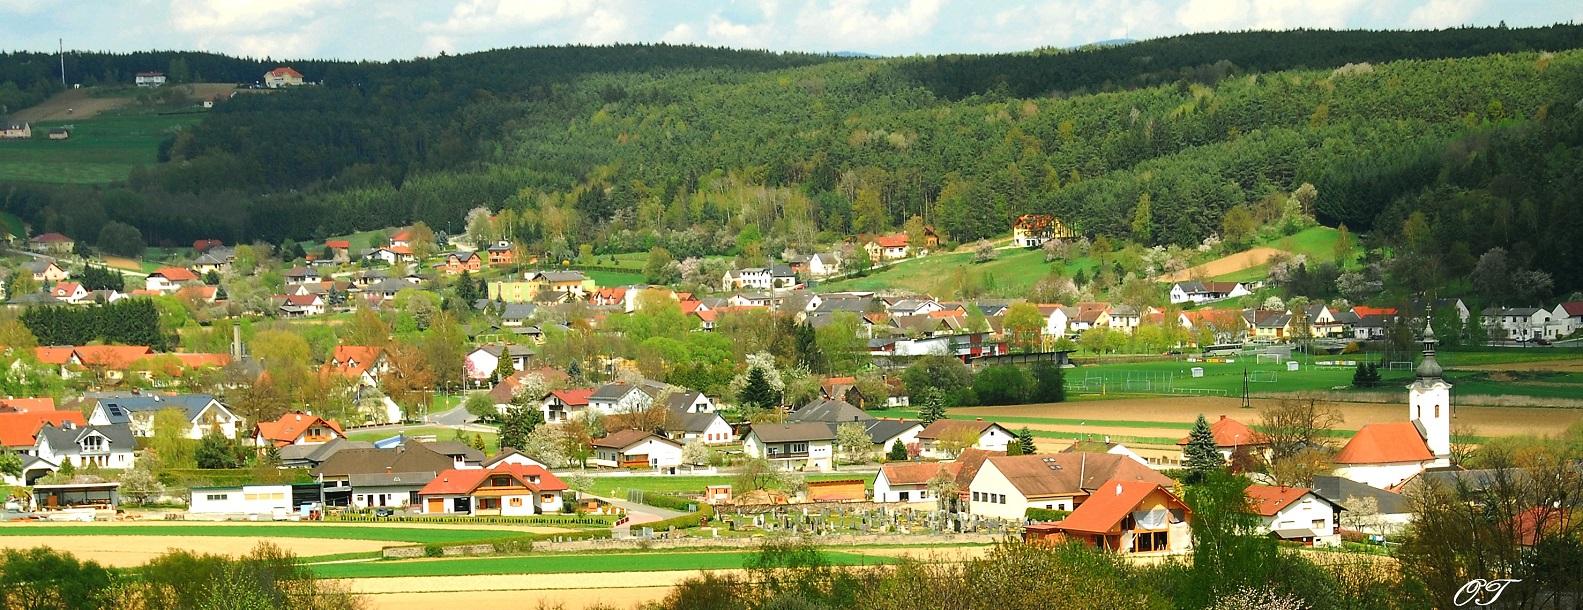 Ollersdorf 2008